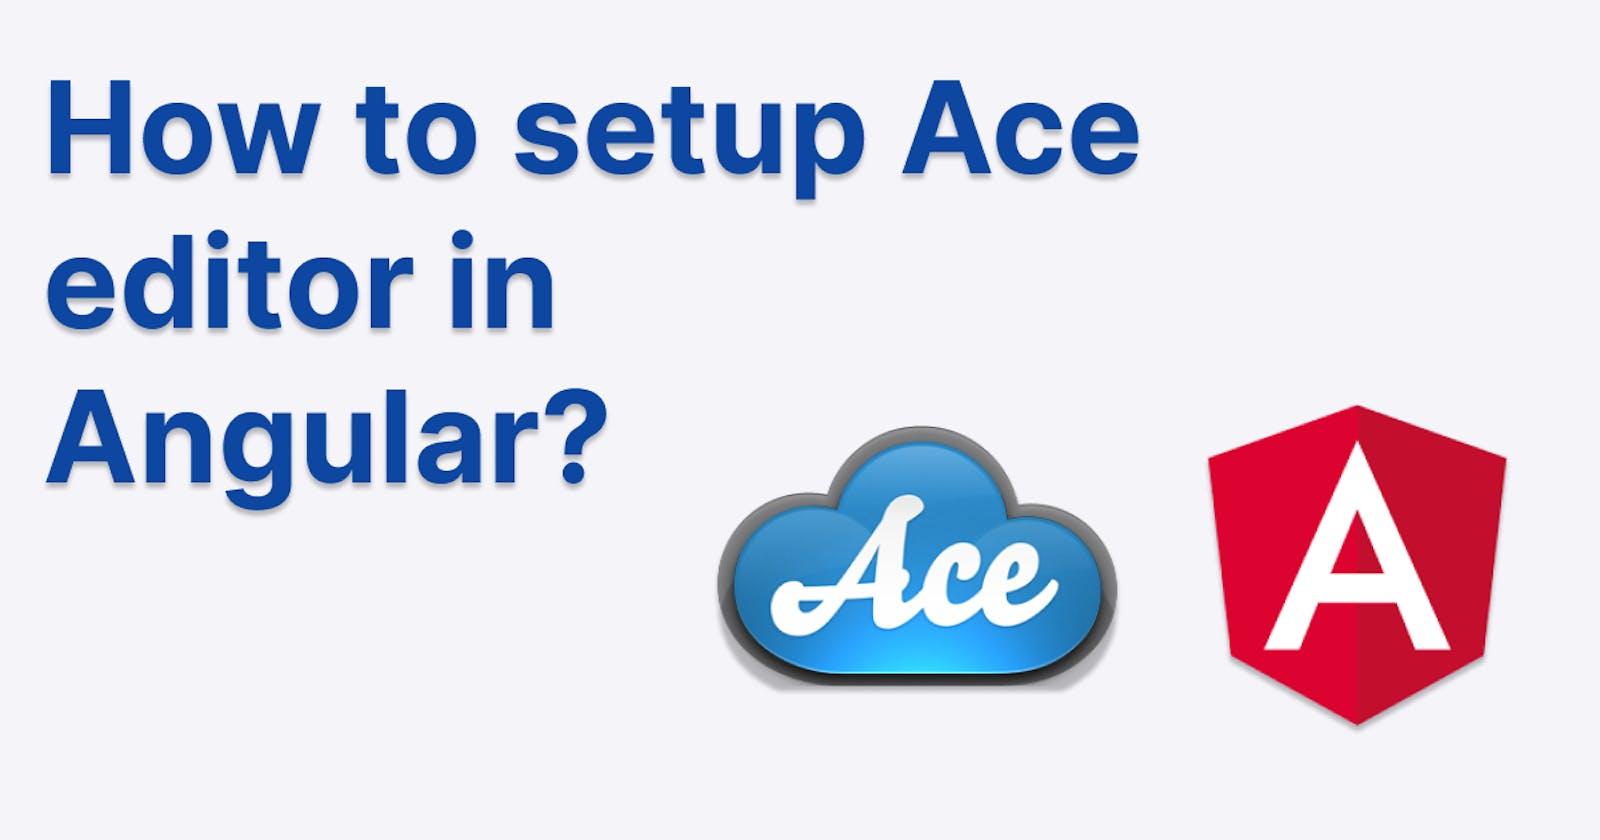 How to setup Ace editor in Angular?